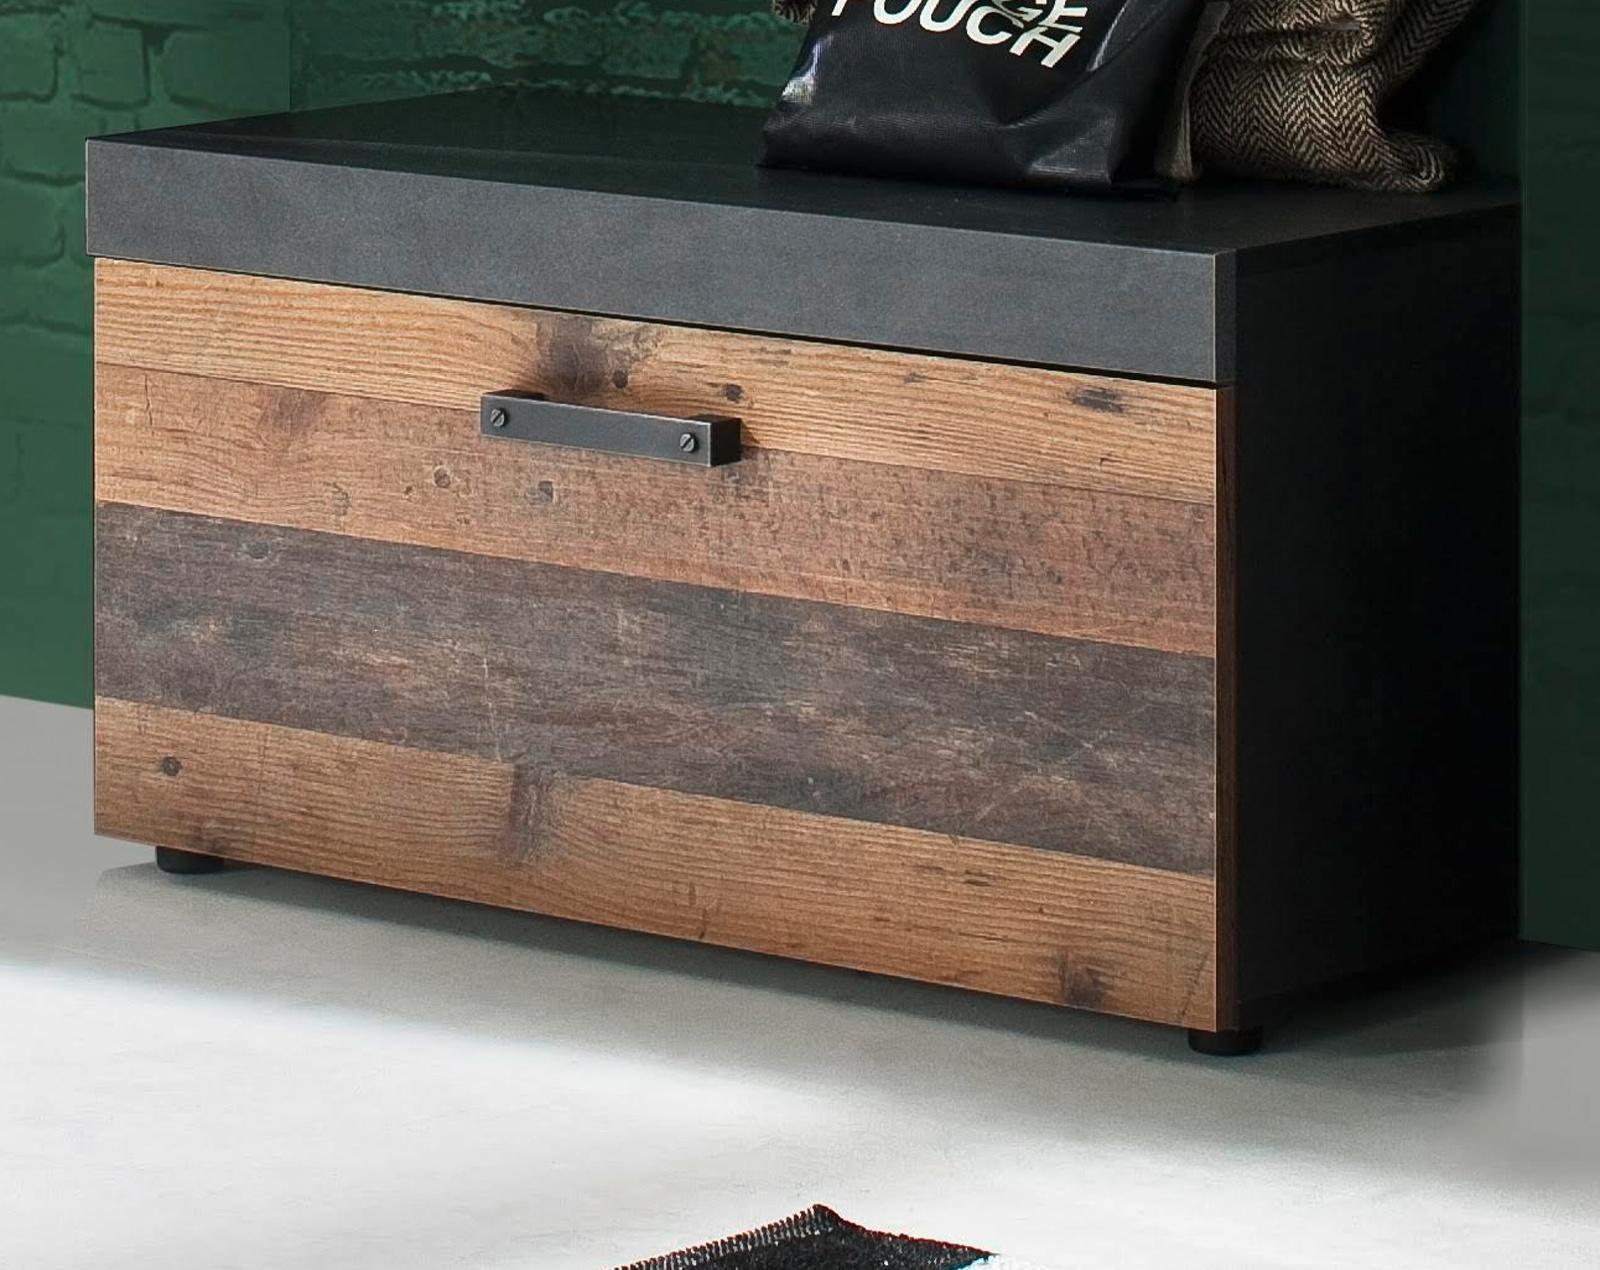 Garderobe Indy Sitzbank in Used Wood Shabby mit Matera grau Schuhbank  Garderobenbank 80 x 45 cm